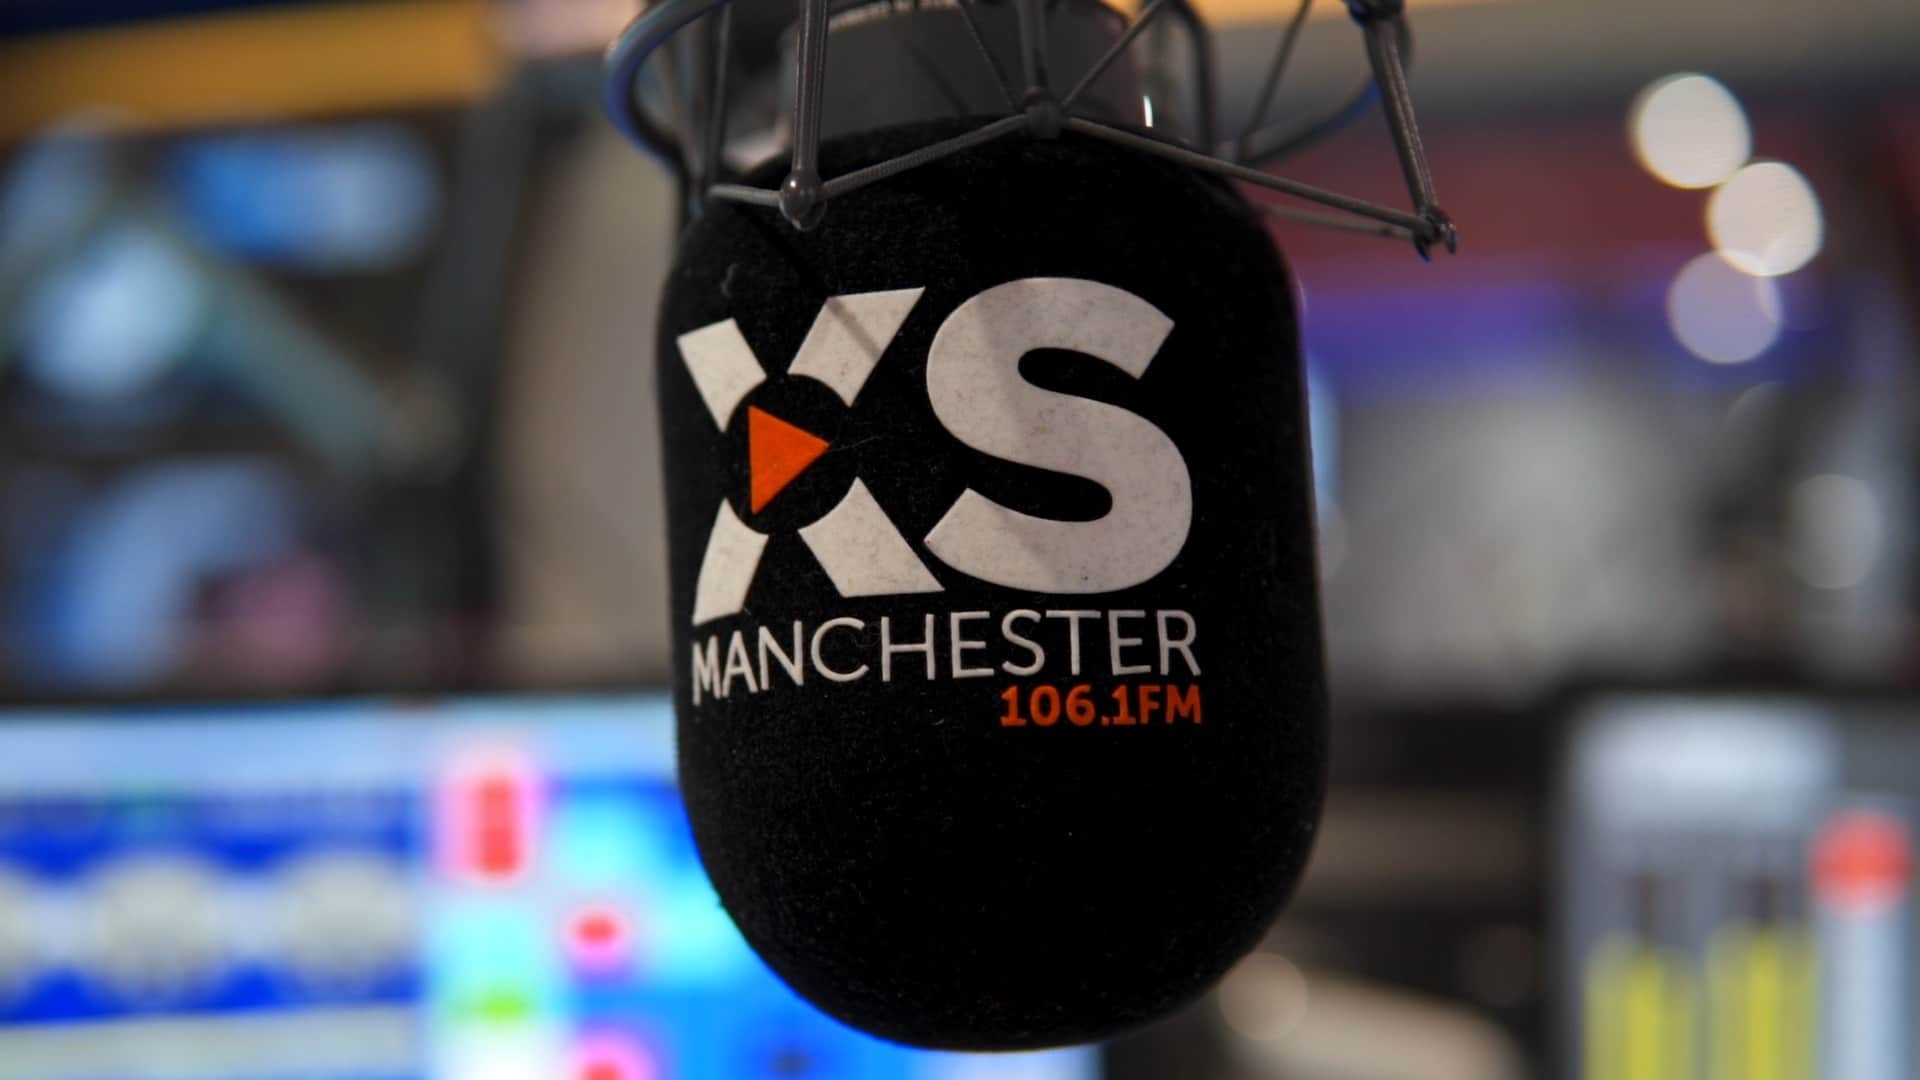 XS Manchester Studio Microphone